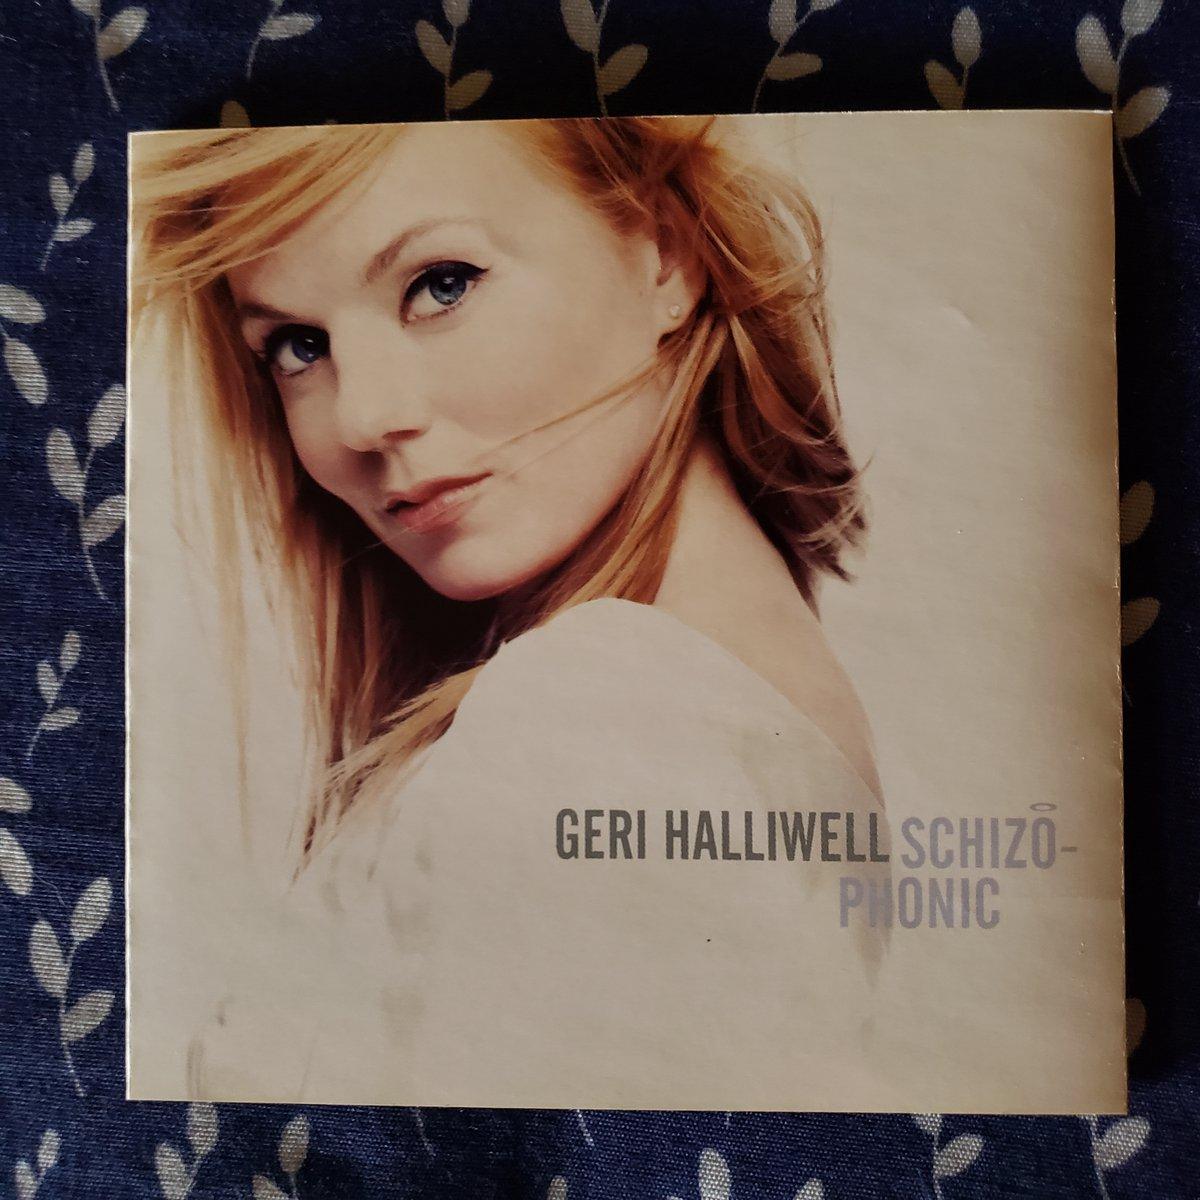 @GeriHalliwell CD Schizophonic Importado De UK   CÓMPRALO AQUÍ 👉 https://t.co/RJmxxE7H5U  #GeriHalliwell #Schizophonic #SpiceGirls #LookAtMe #GingerSpice #MiChicoLatino #LiftMeUp #BagItUp #Giner #Spice #TheSpiceGirls #GeriHorner @spicegirls https://t.co/wPyYkpxm7R